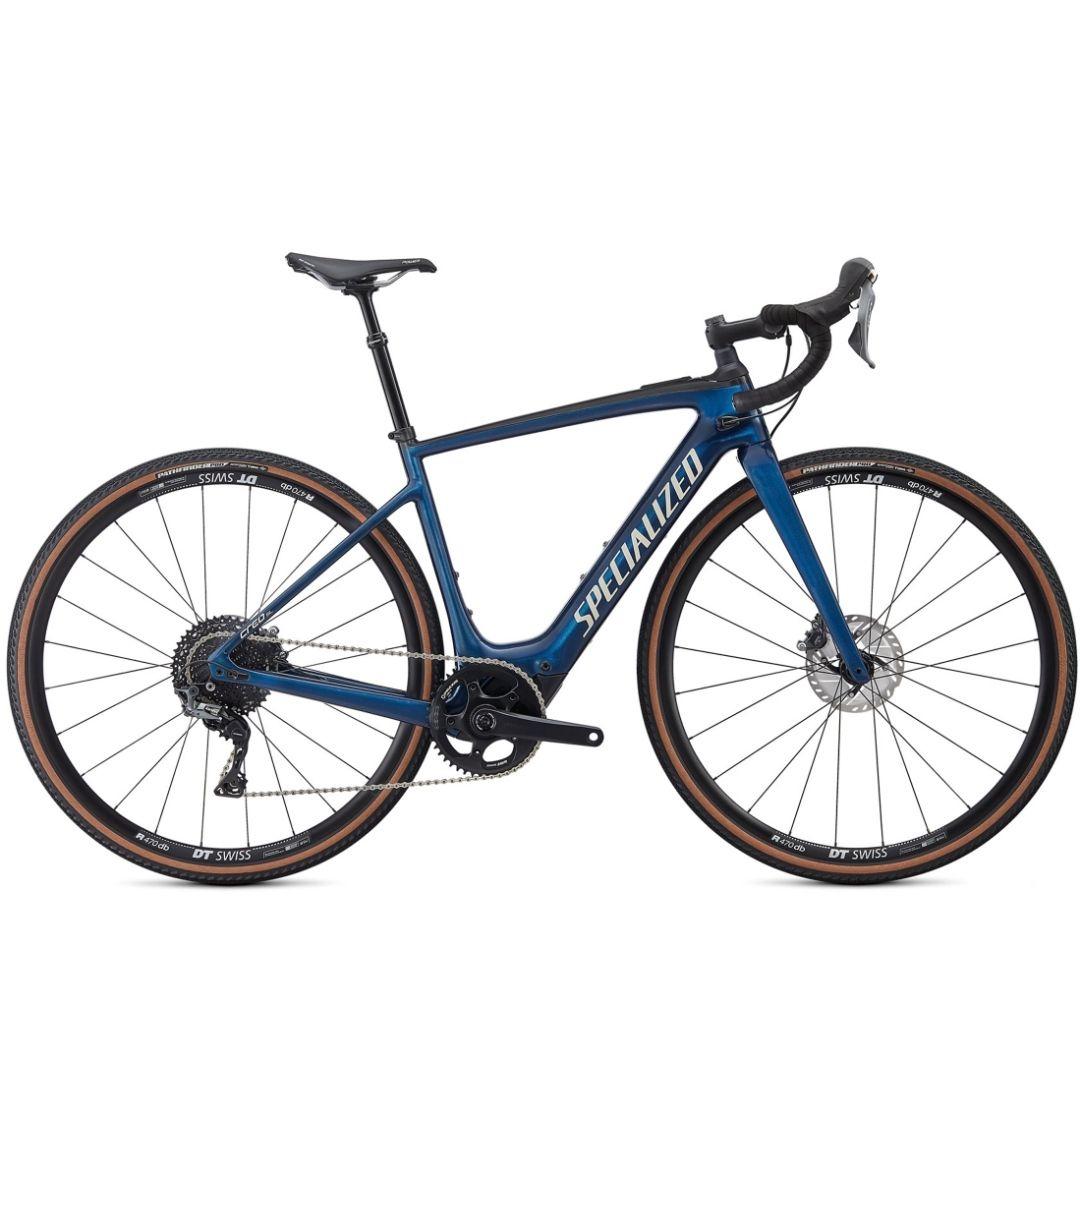 Specialized Creo SL Comp Carbon Evo - Elektro Gravel Bike 2020 |Fahrrad carbon